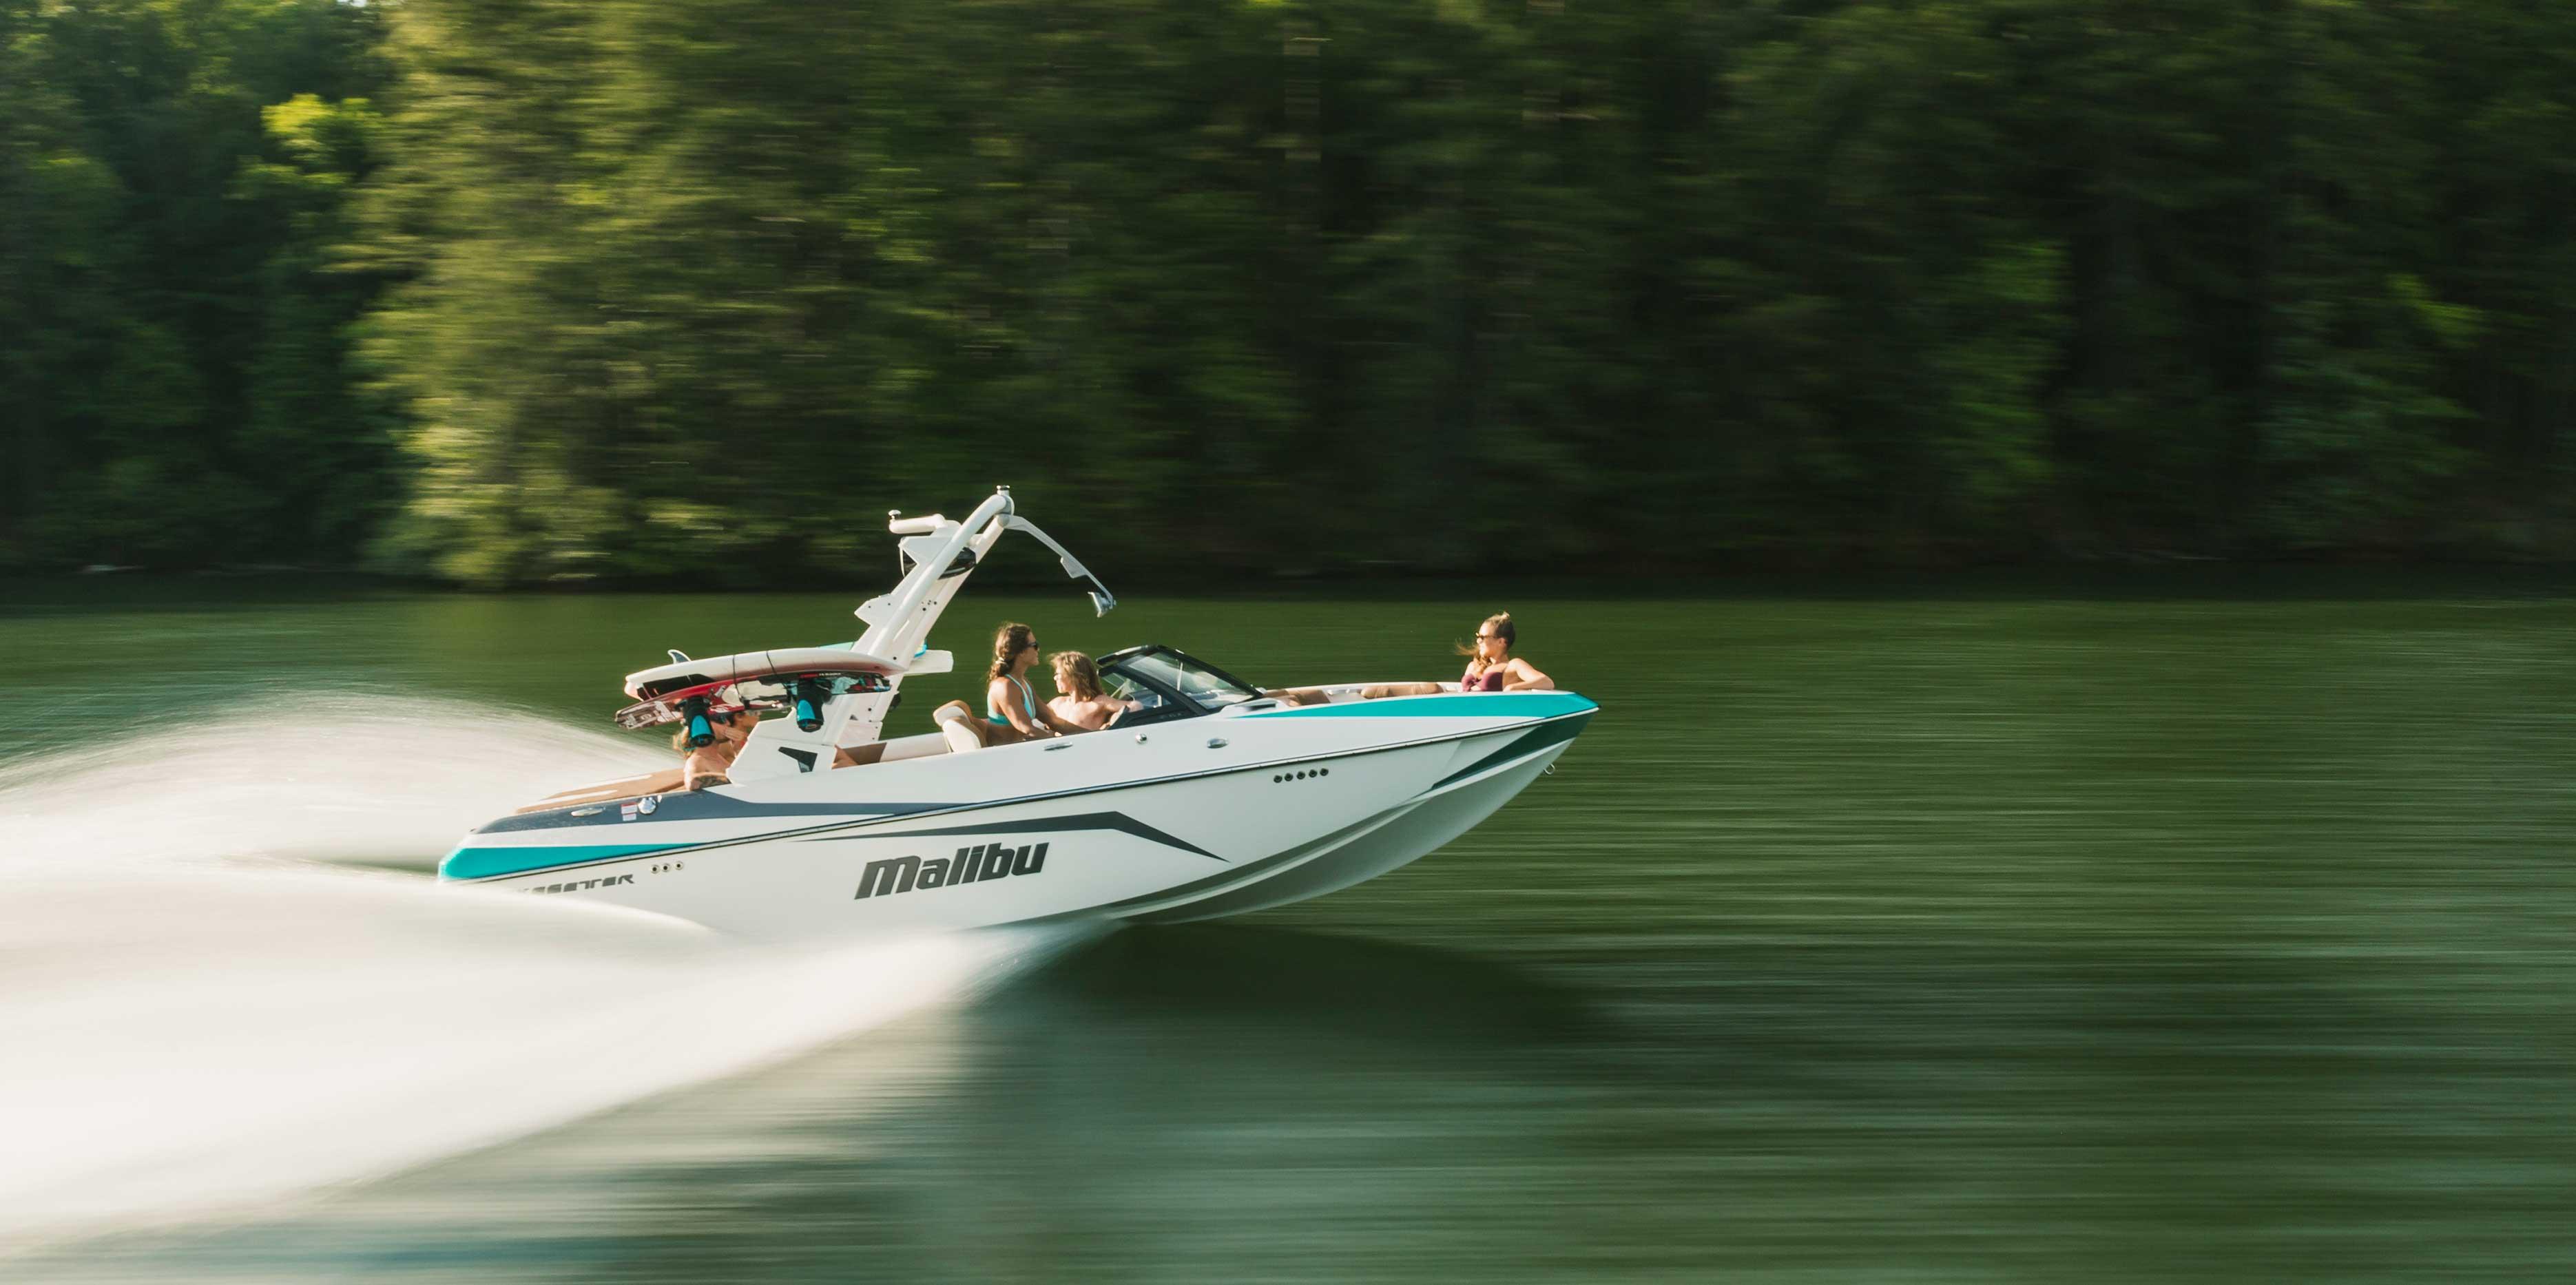 2021 Malibu Boats Wakesetter 21 VLX running